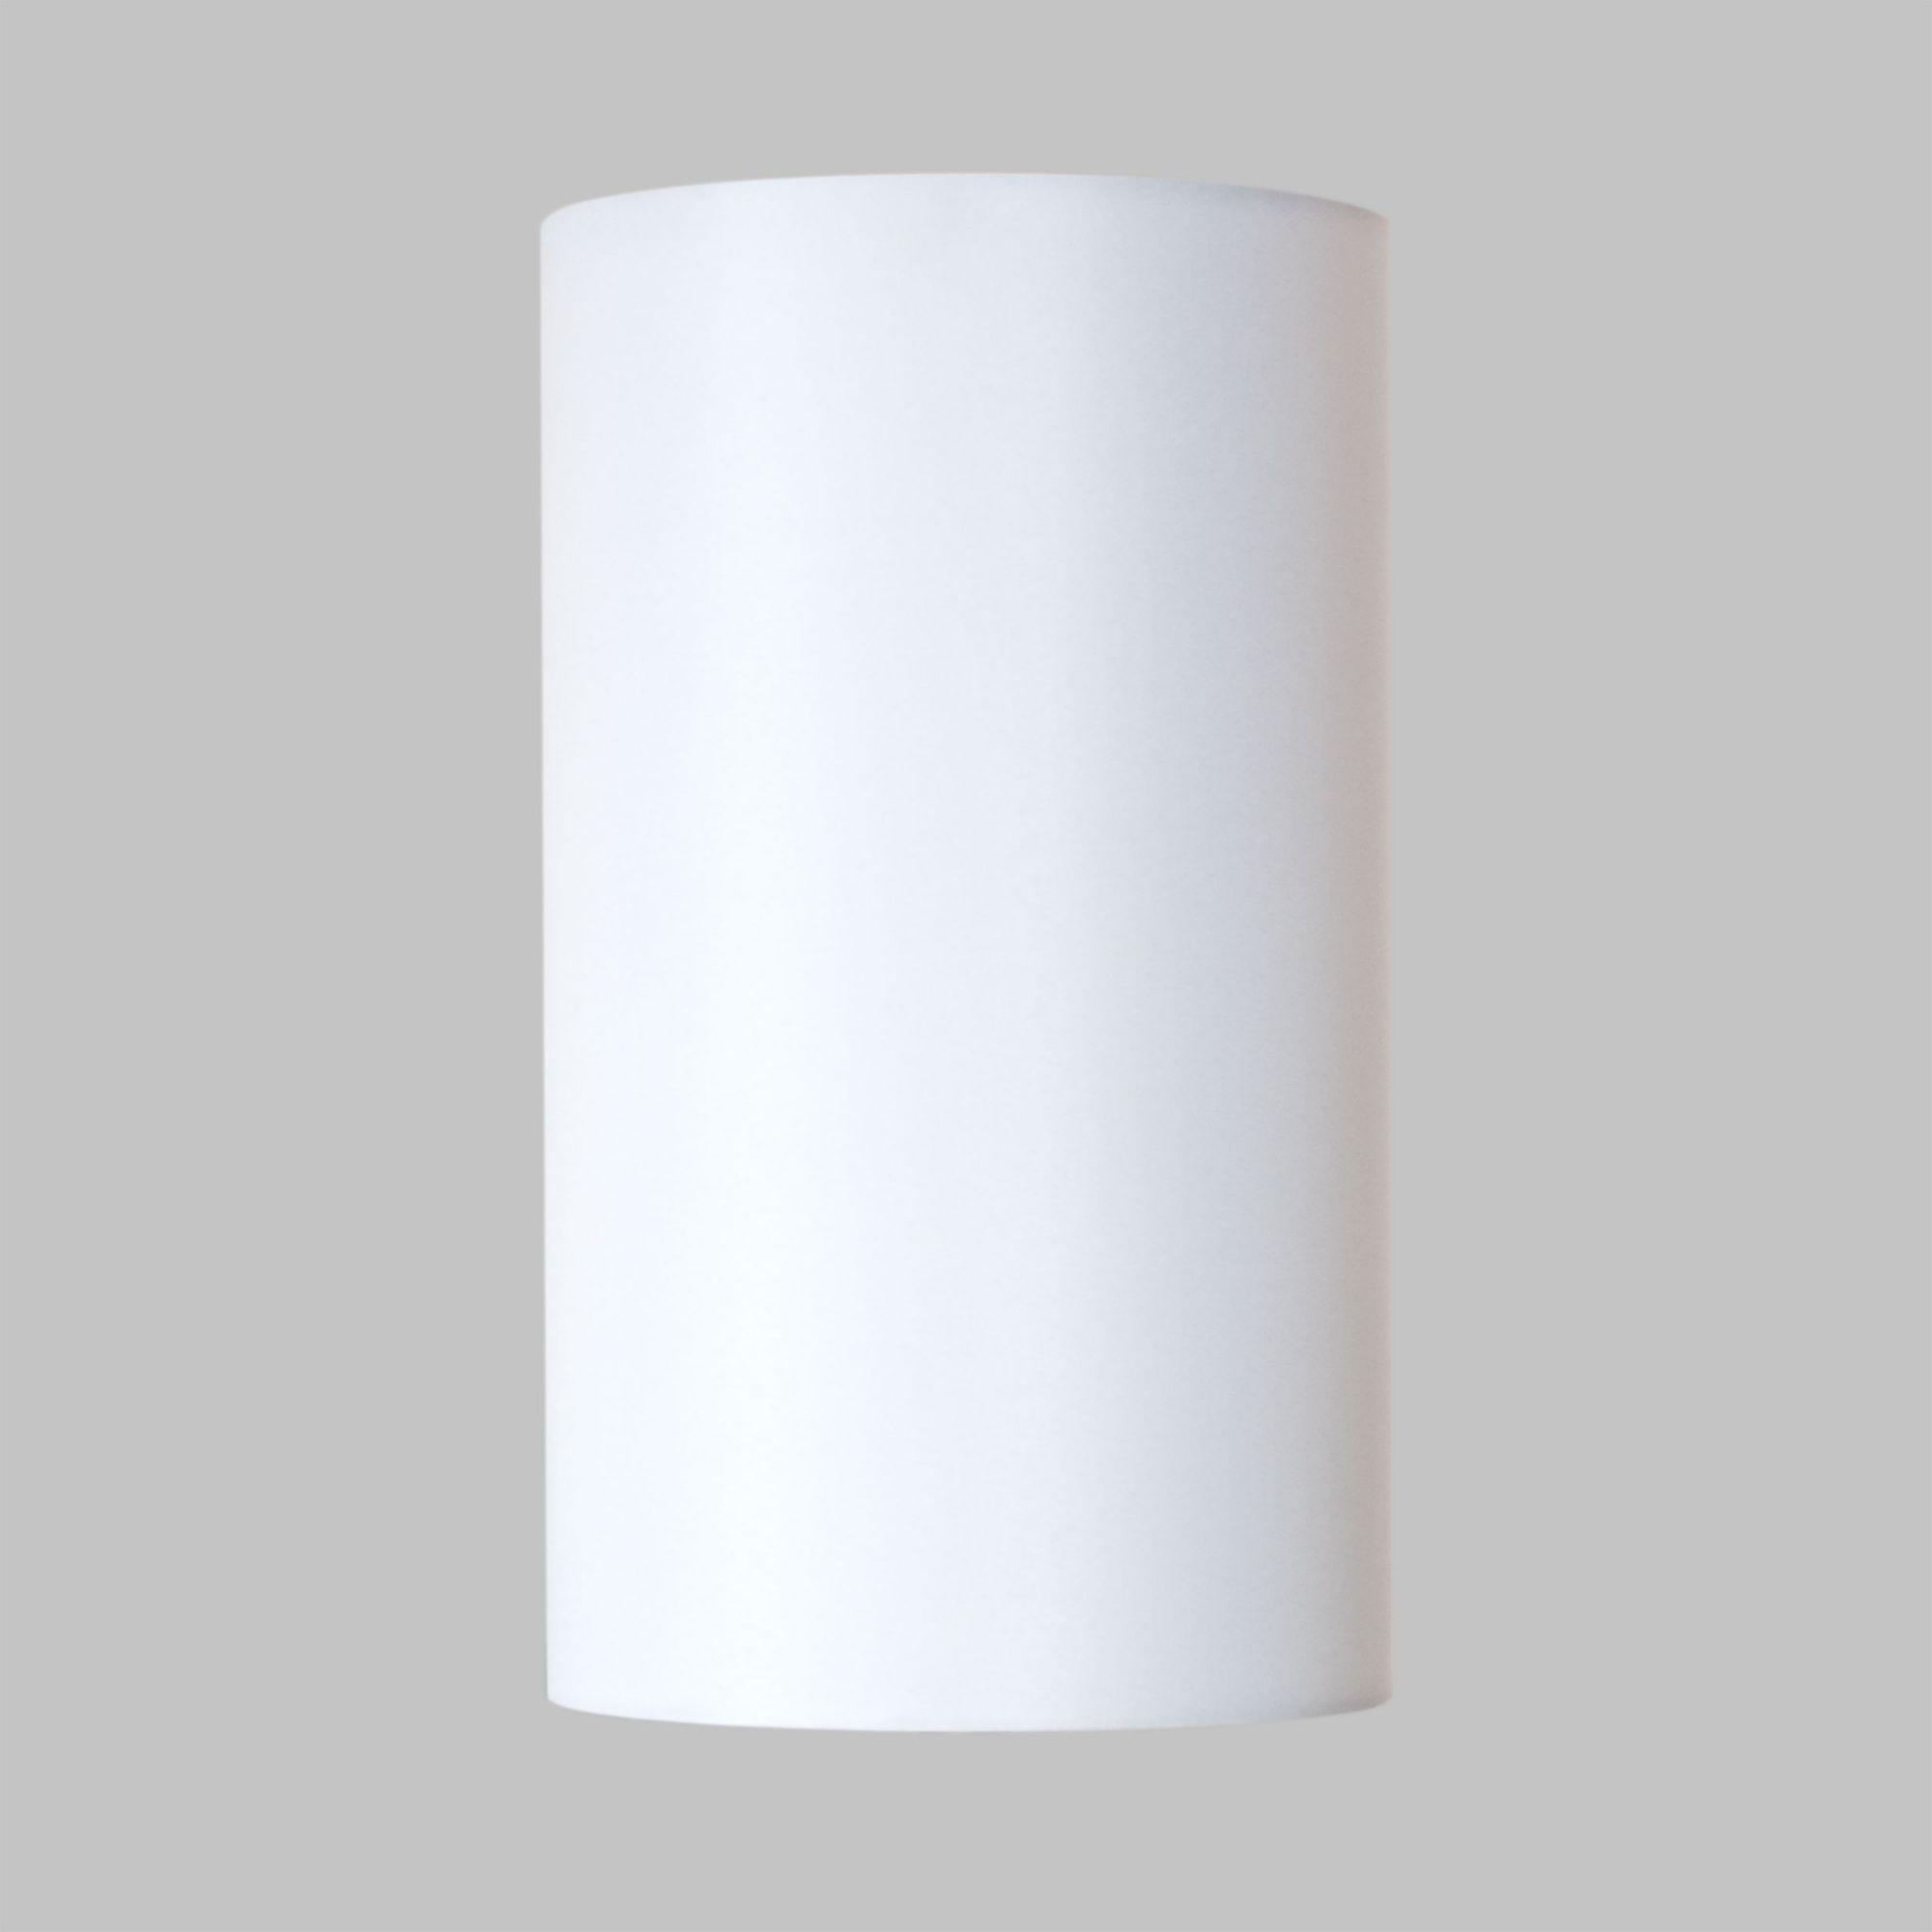 Abażur Tube 120 4058 Biały Astro Lighting